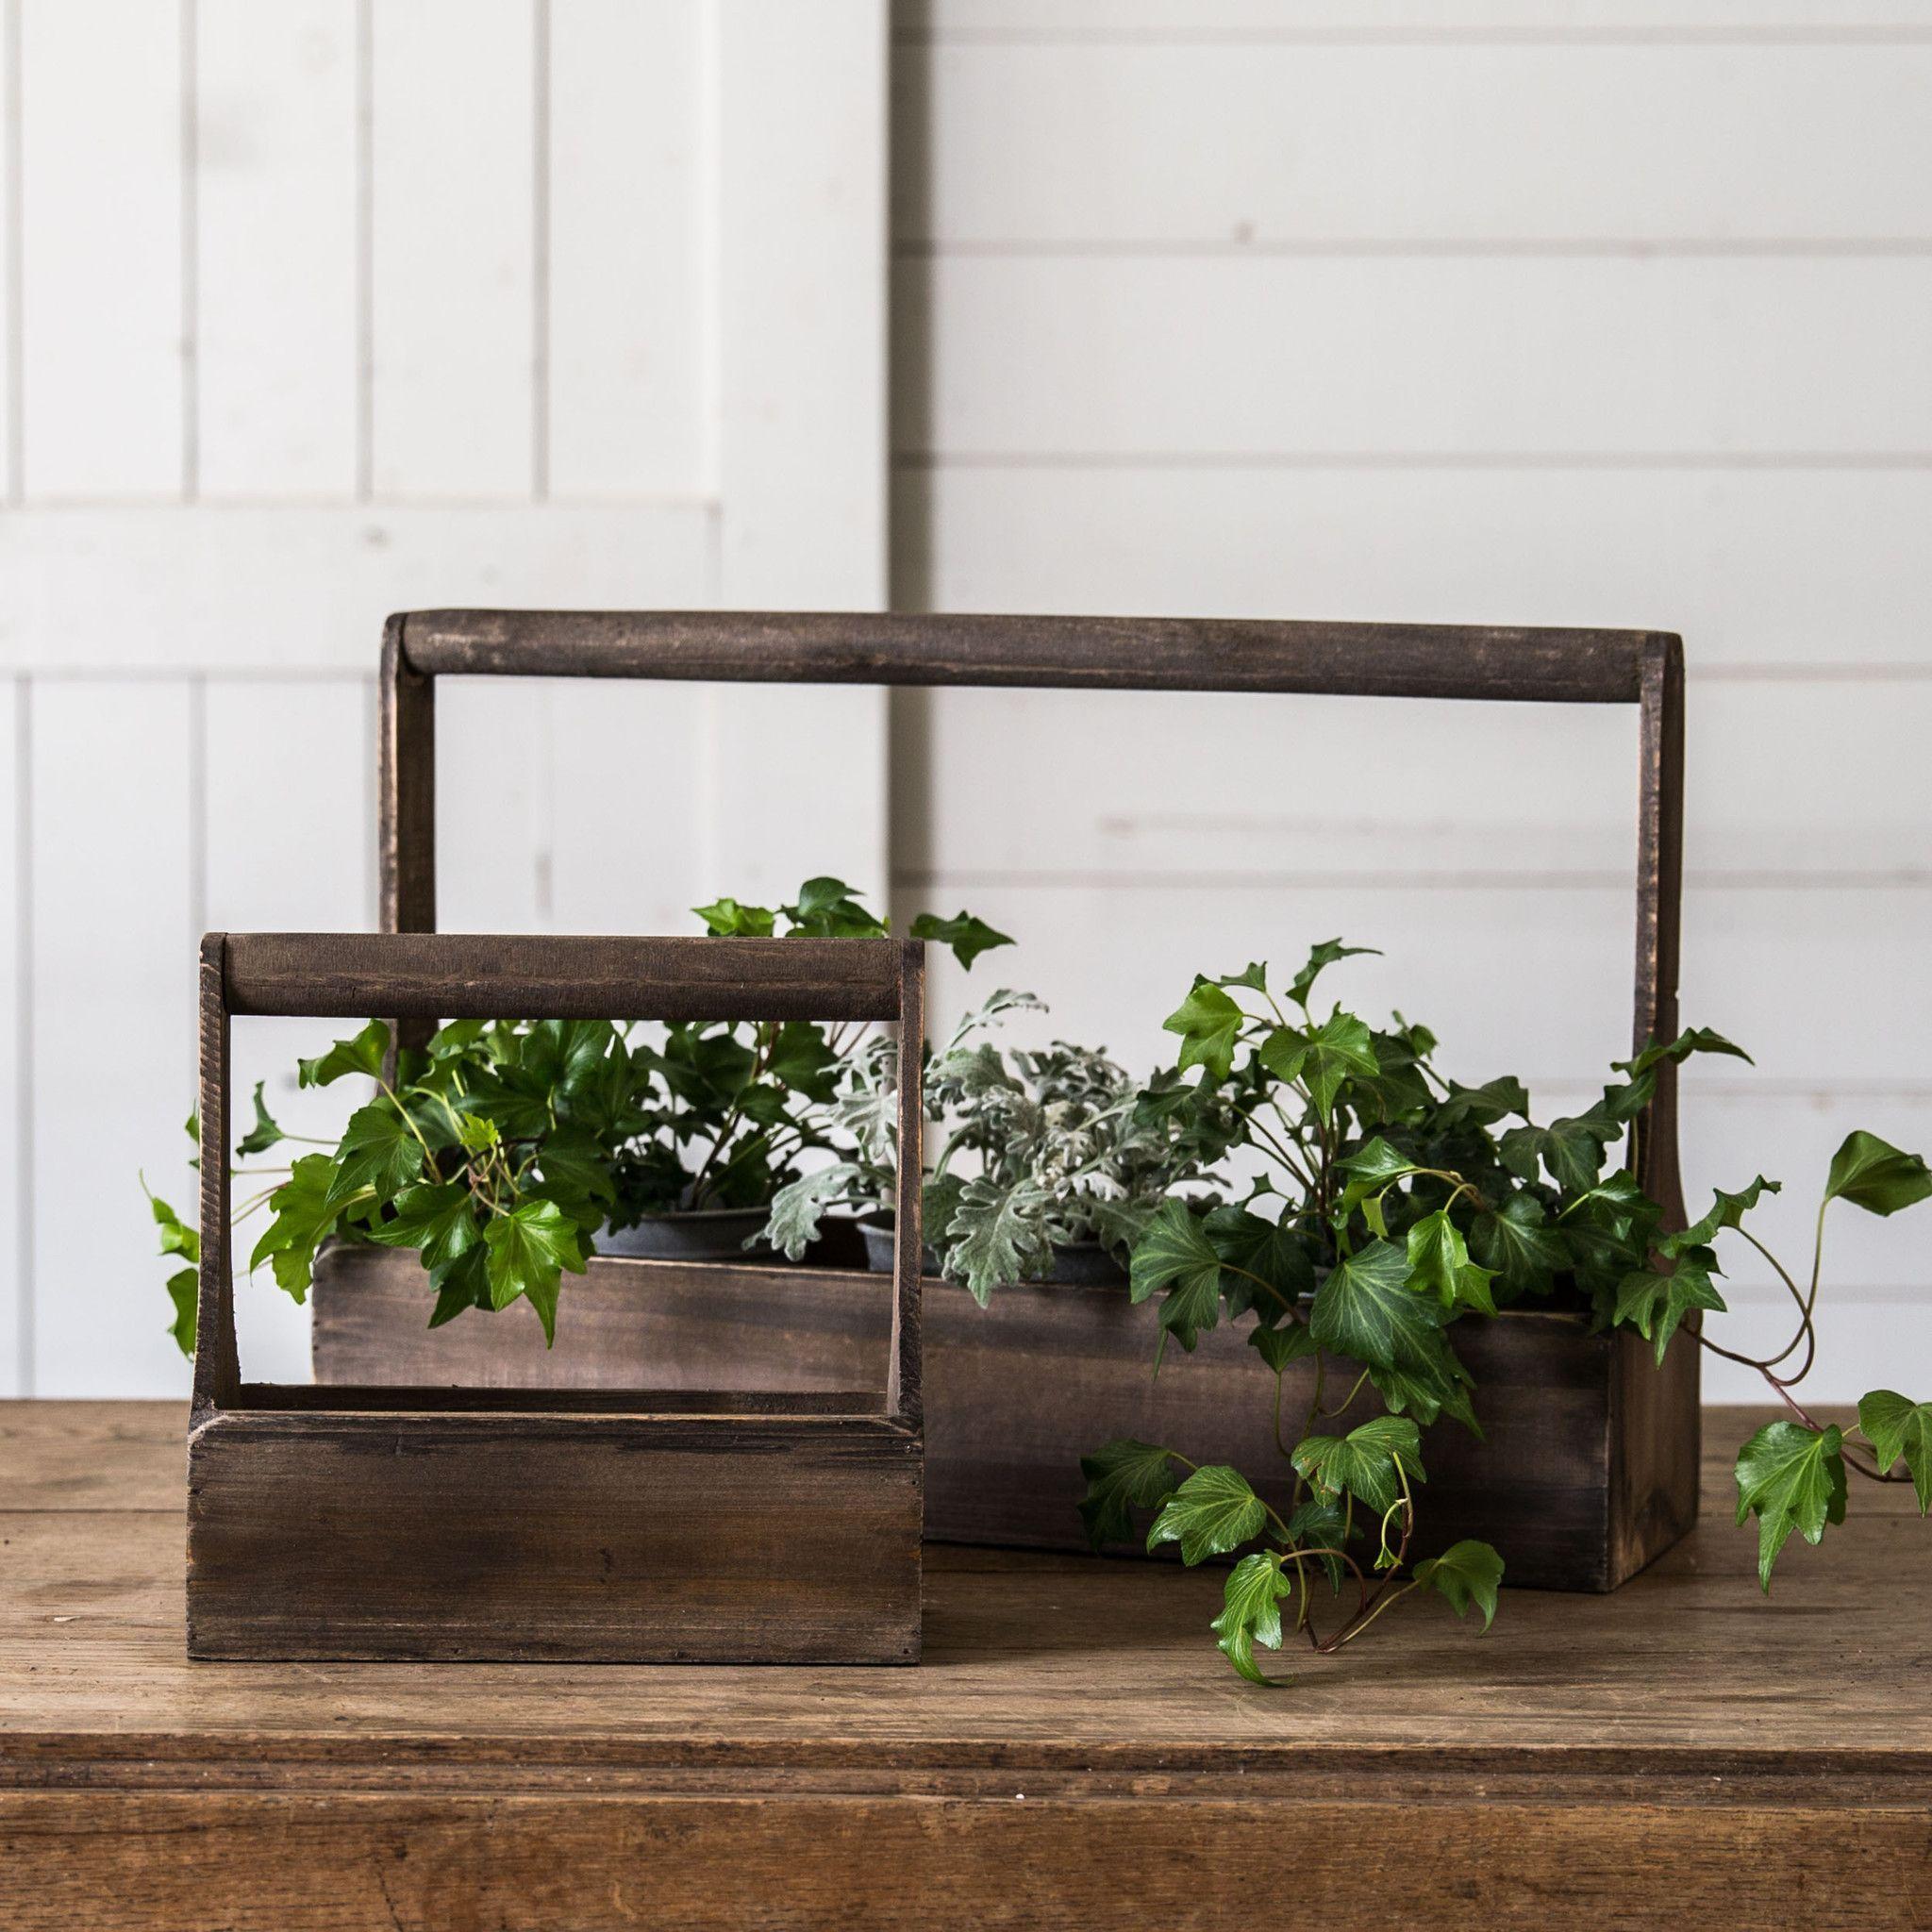 Wood Planter Basket Regular price 1000 small